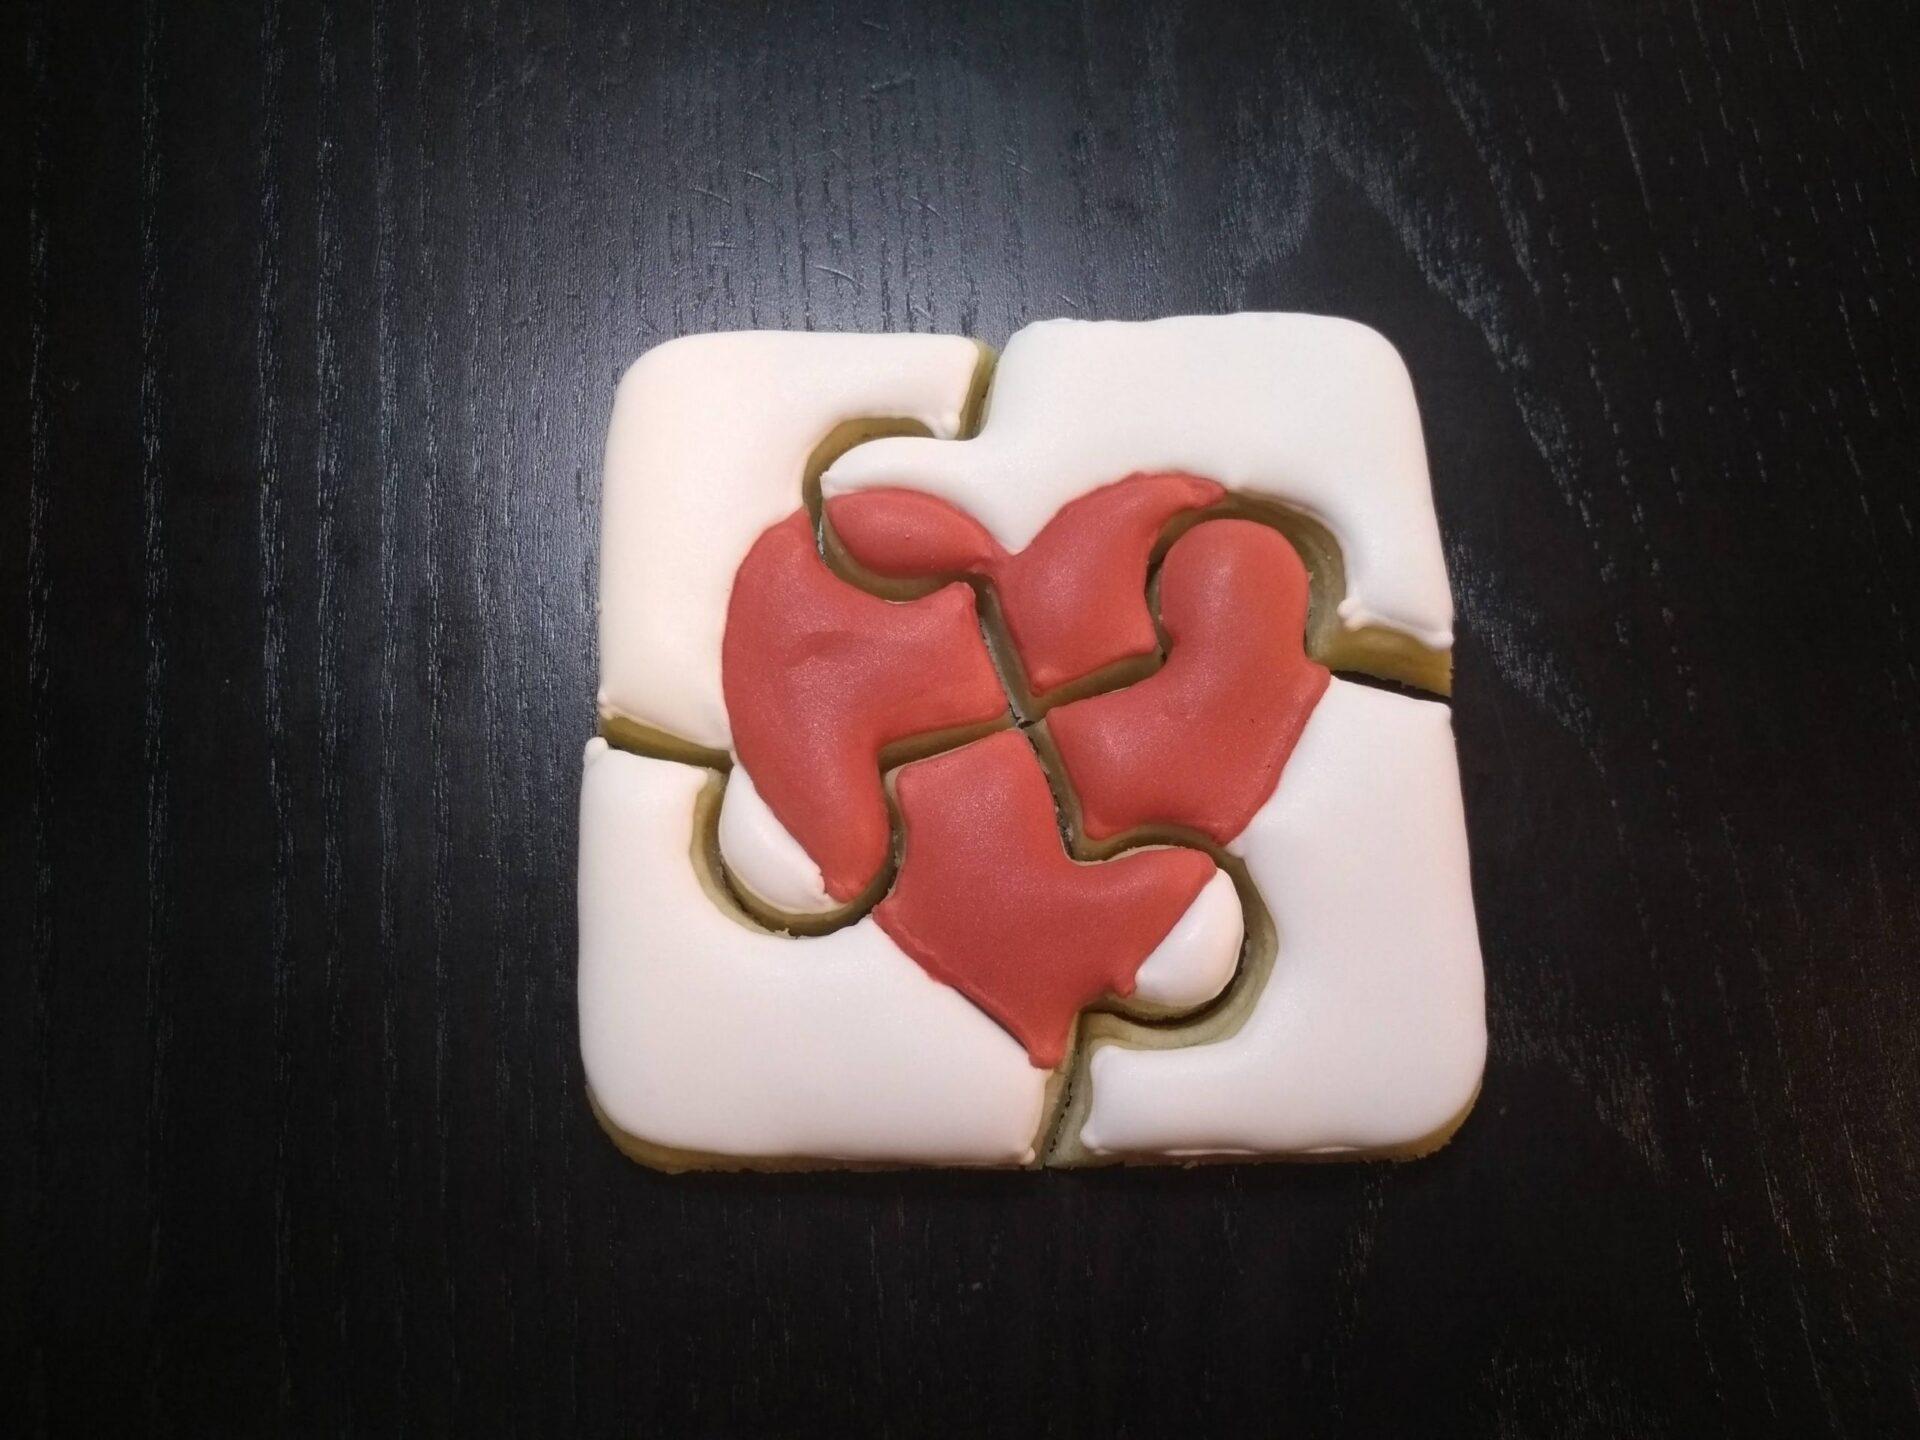 autism puzzle royal icing sugar cookies